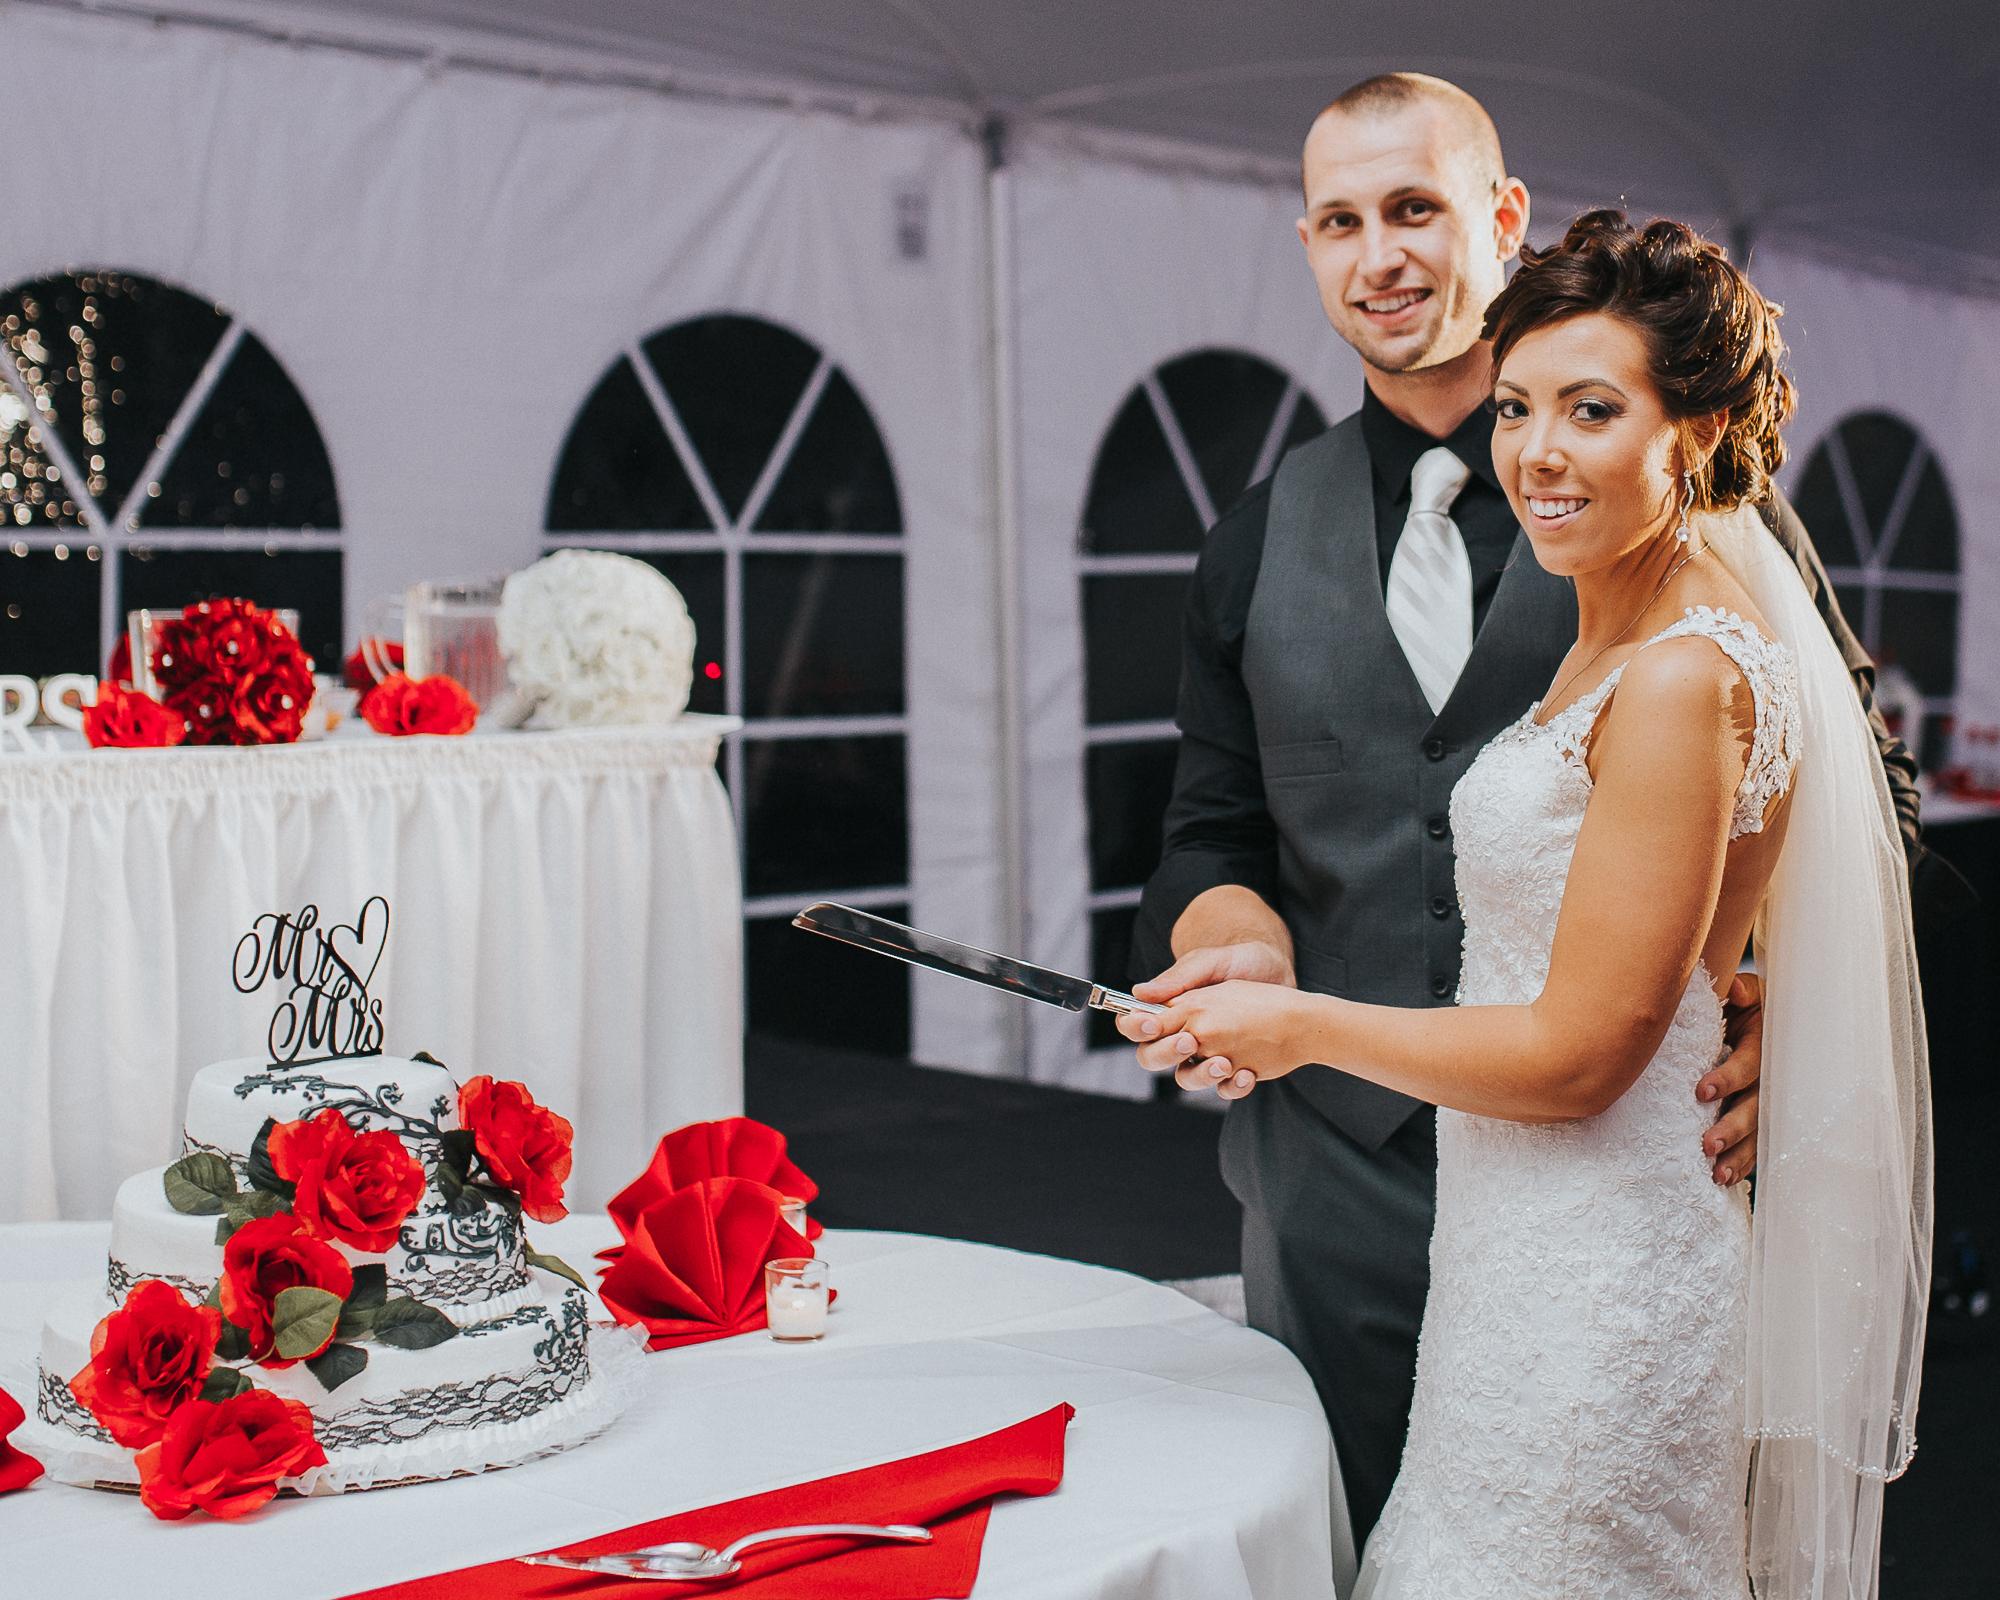 Christina-and-Gene-Wedding-Marla-Rain-Photography-590.jpg